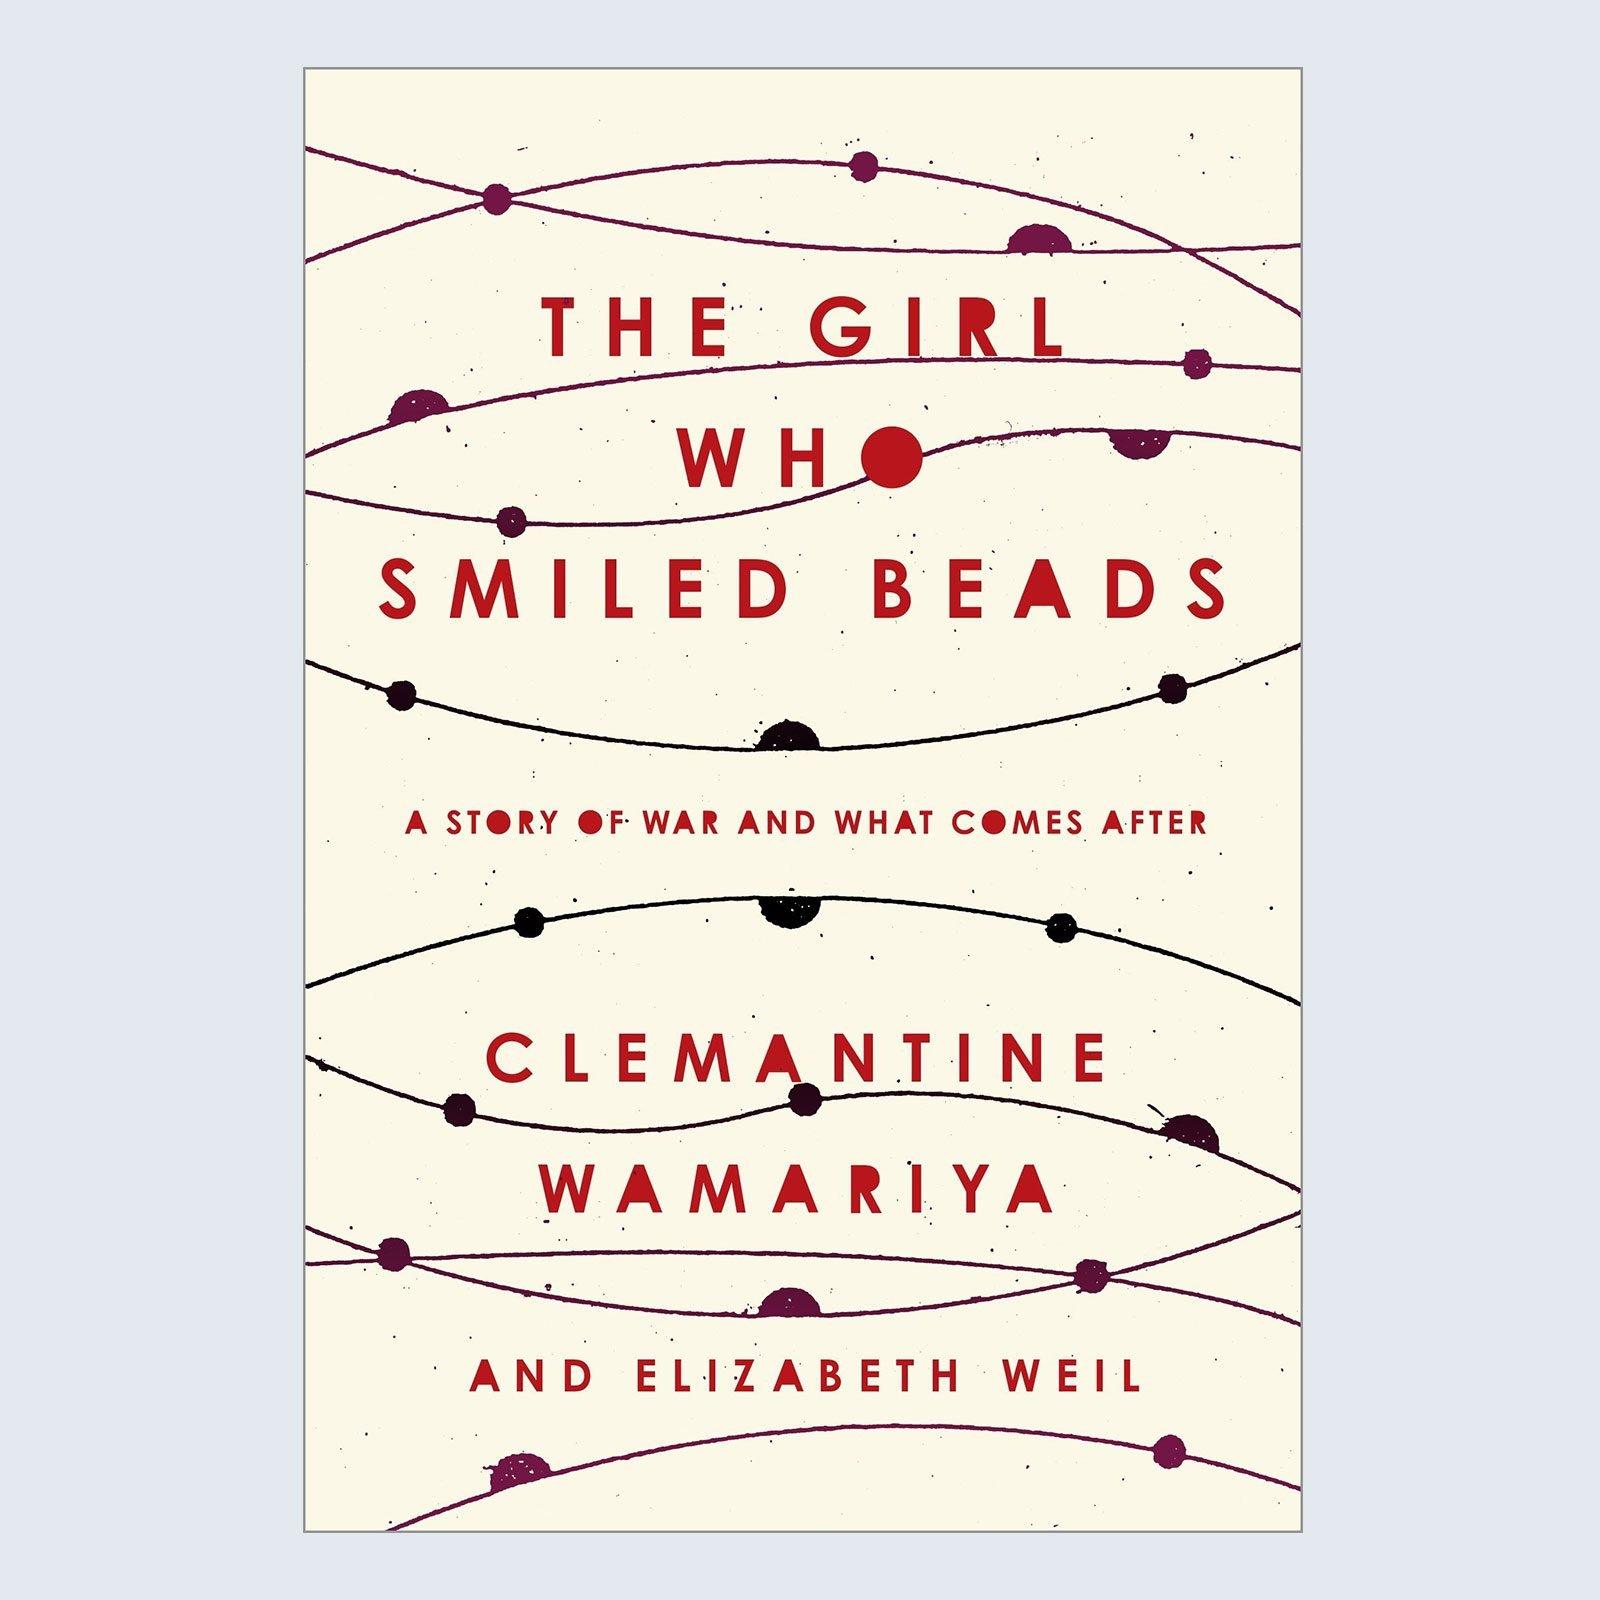 The Girl Who Smiled Beads by Clemantine Wamariya